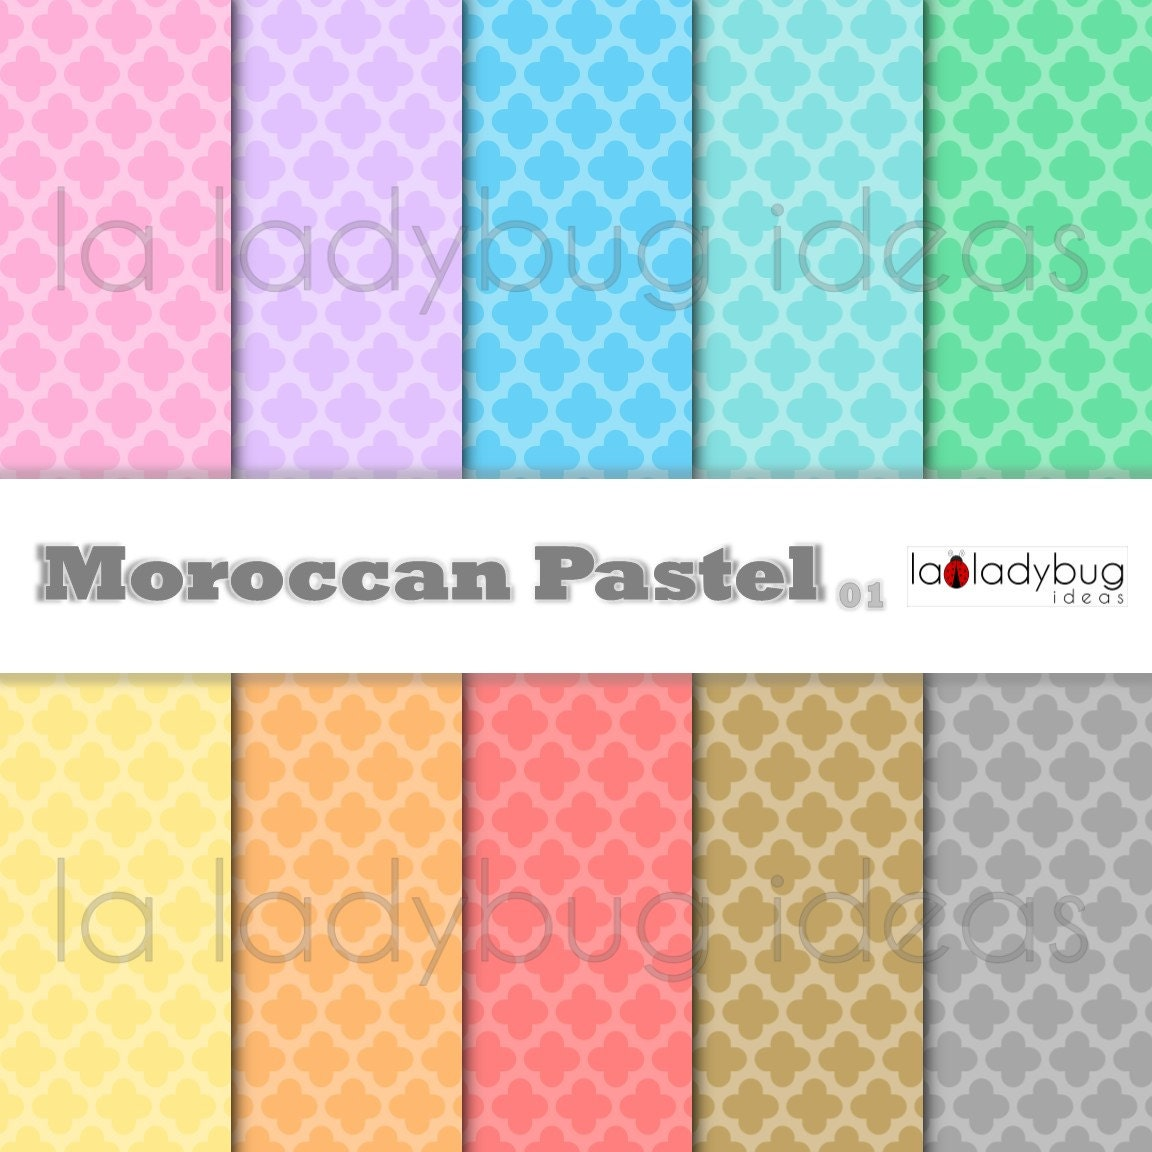 marokkanische tapete marokko pastell digitalem papier. Black Bedroom Furniture Sets. Home Design Ideas